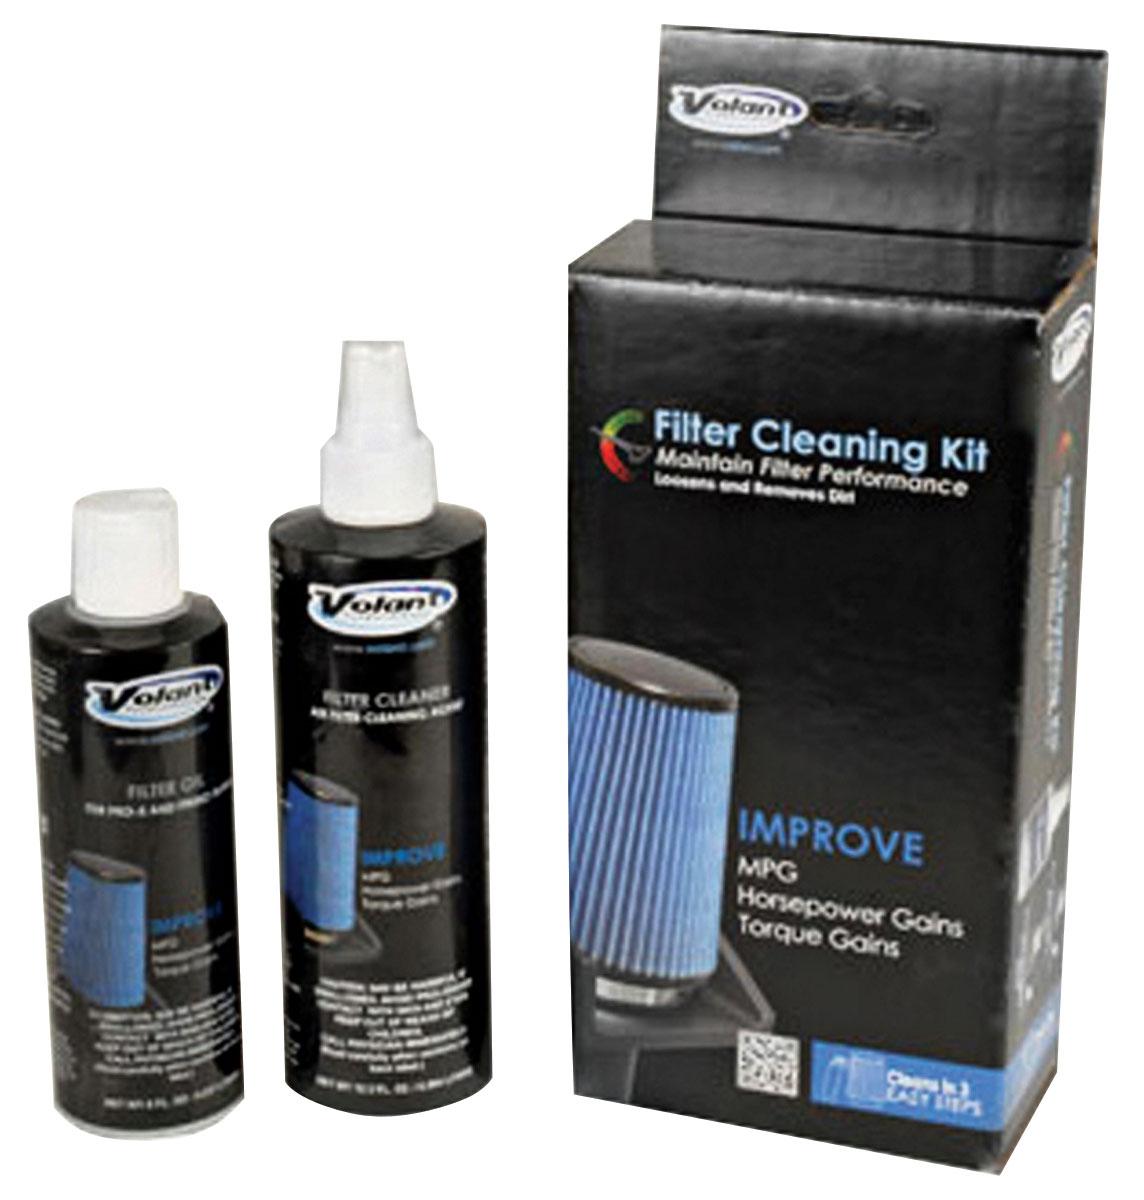 Filter, Air, Recharger Kit, MaxFlow 5